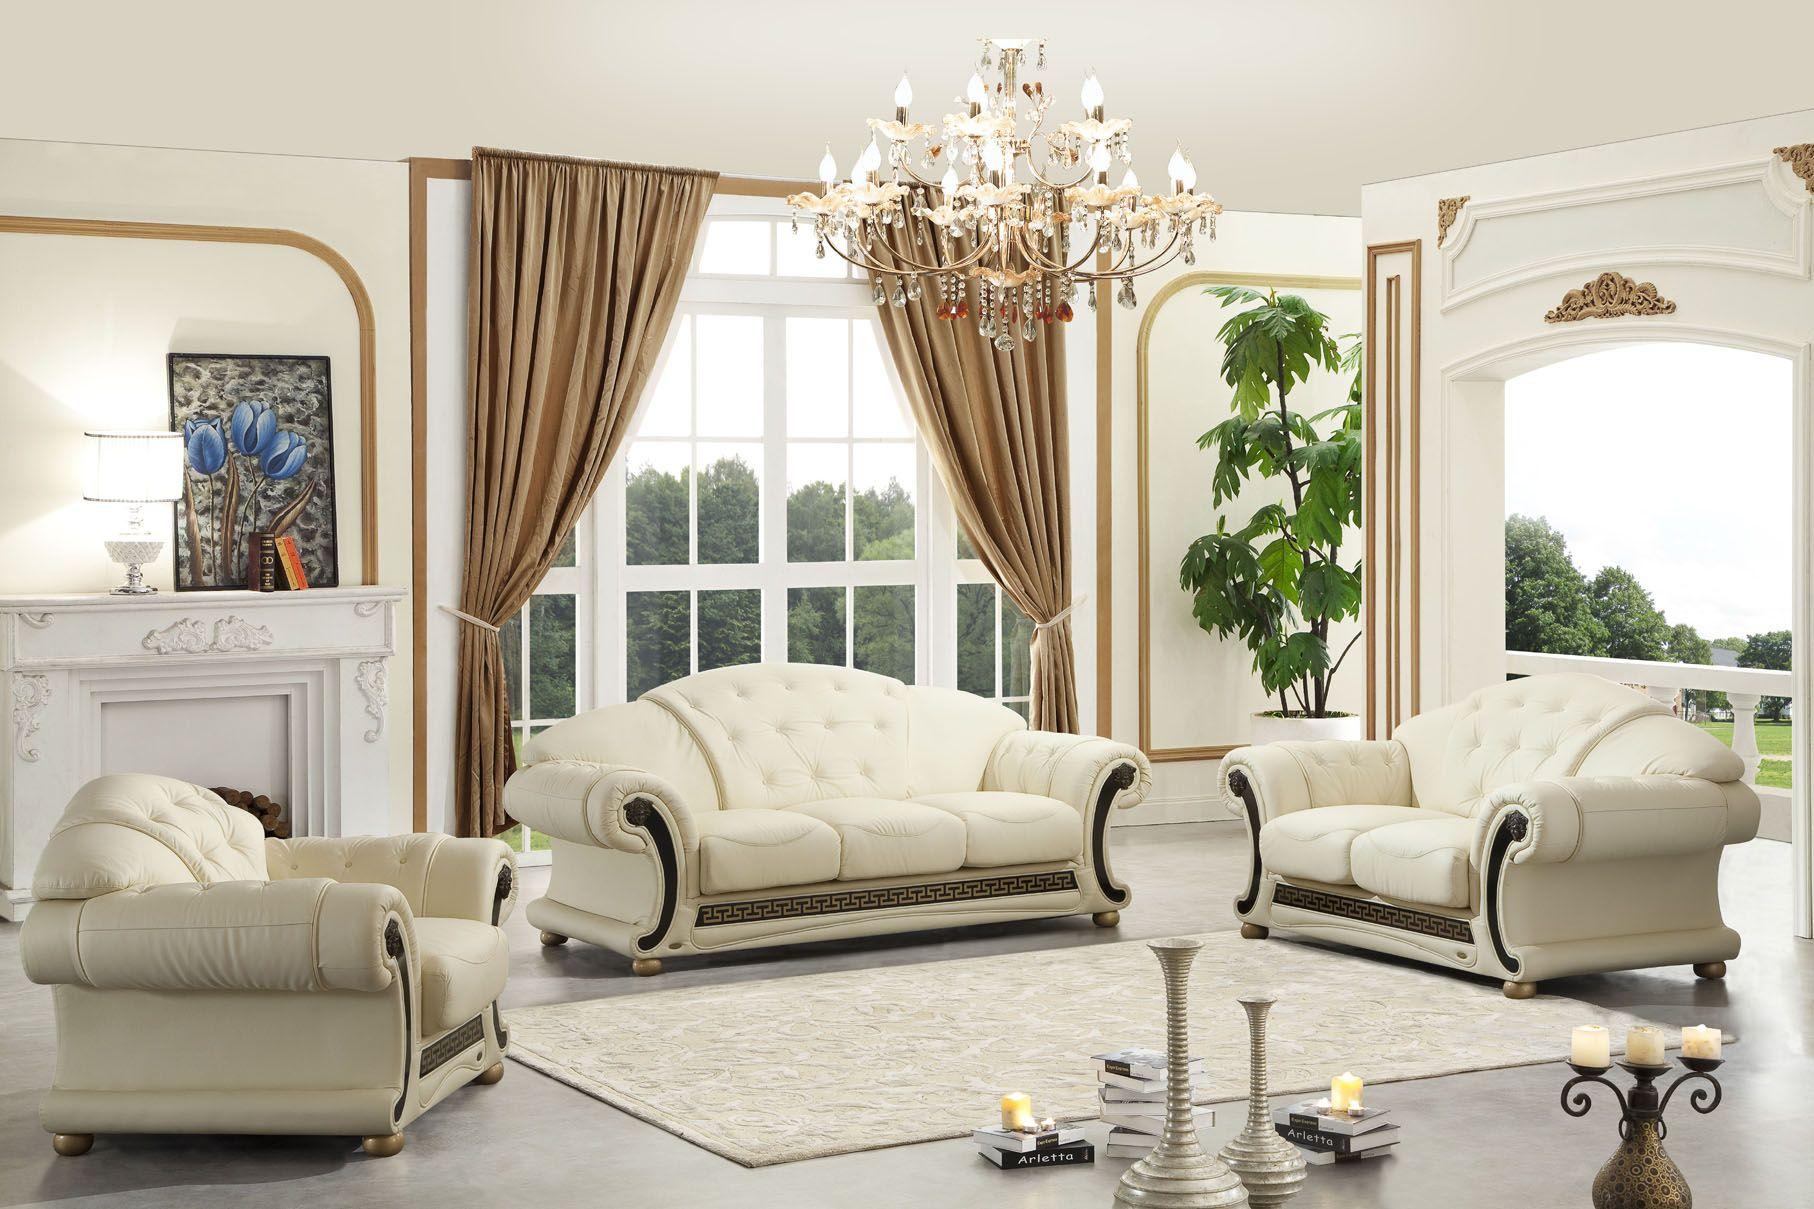 Versace Sofa Furniture Store Toronto Living Room Sets Beige Living Rooms Leather Sofa Living Room Italian leather living room sets